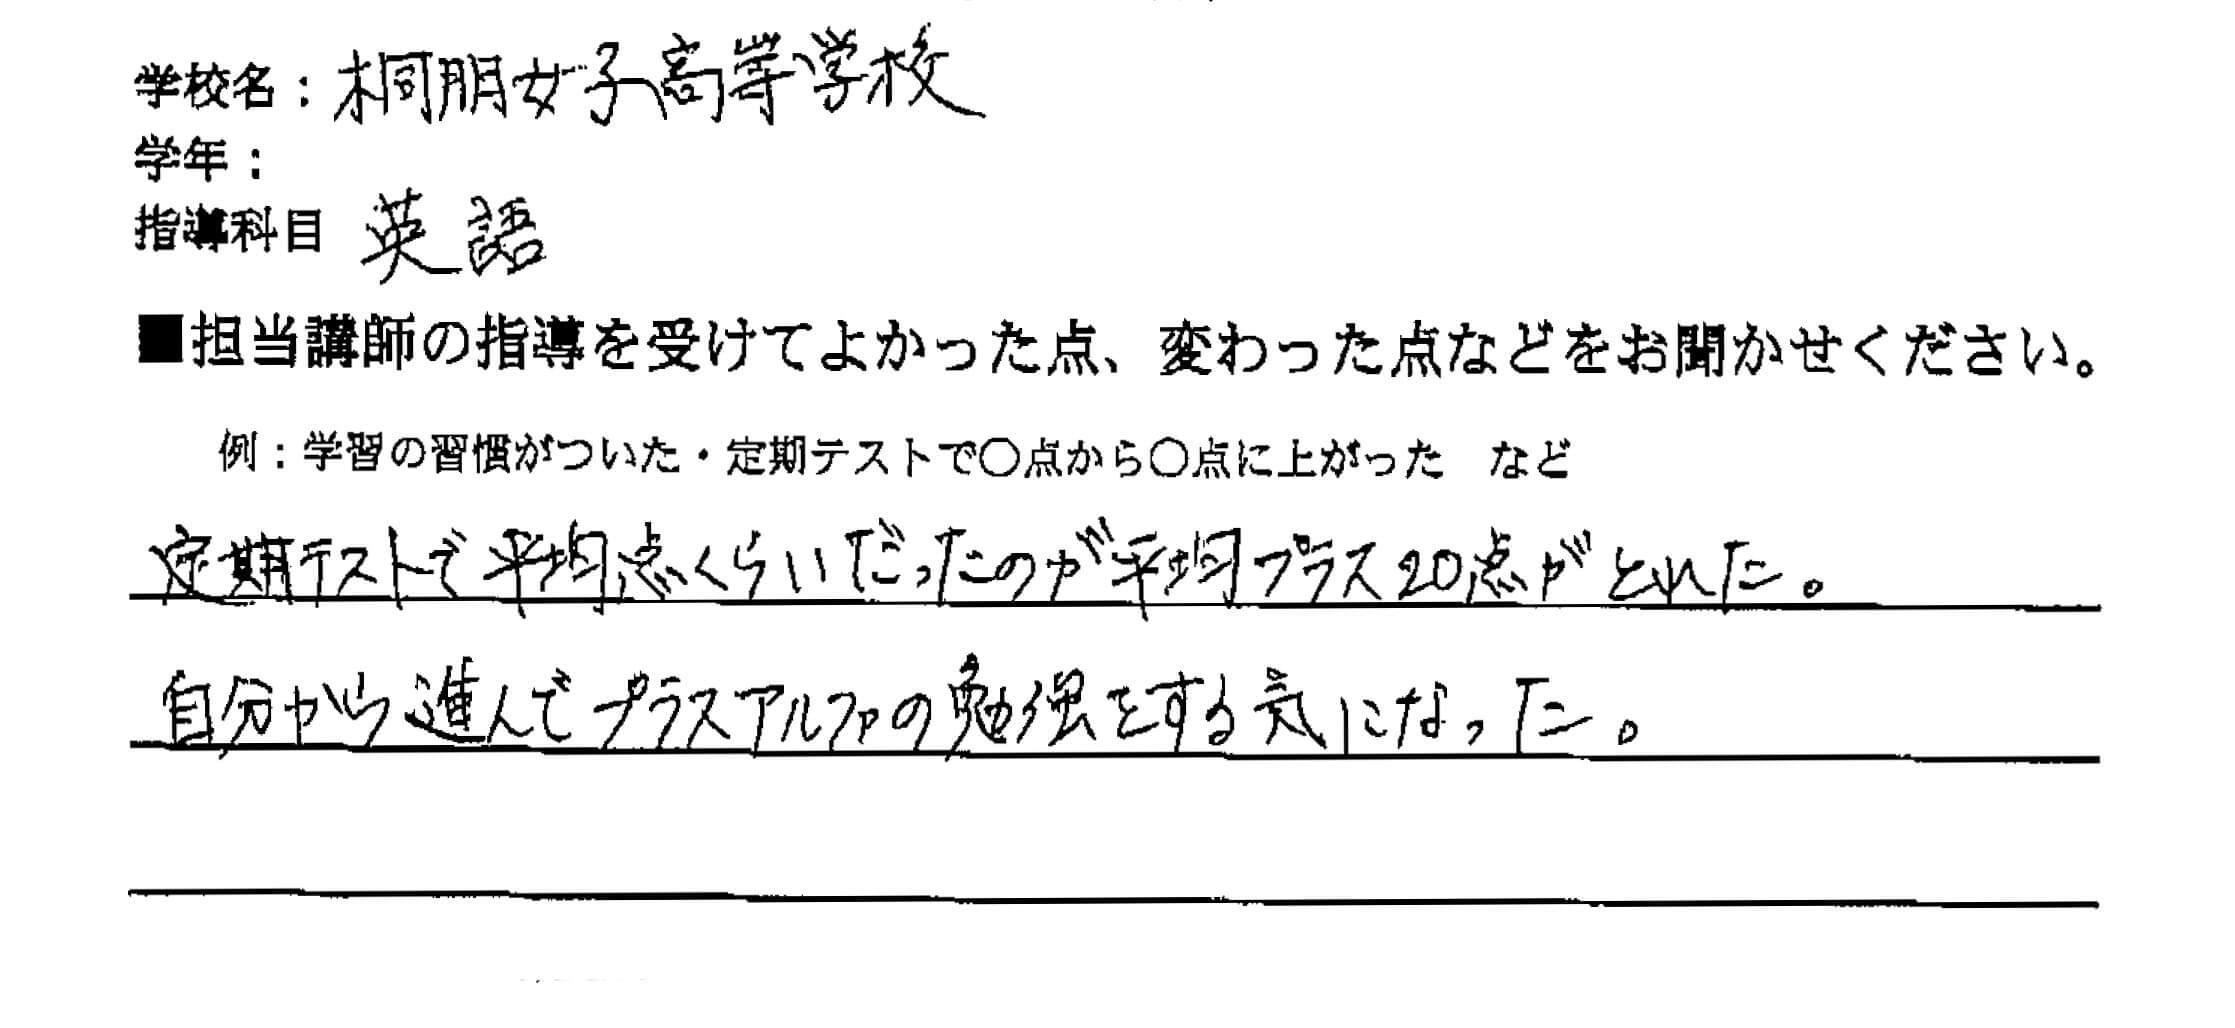 桐朋女子高等学校 A・Sさん